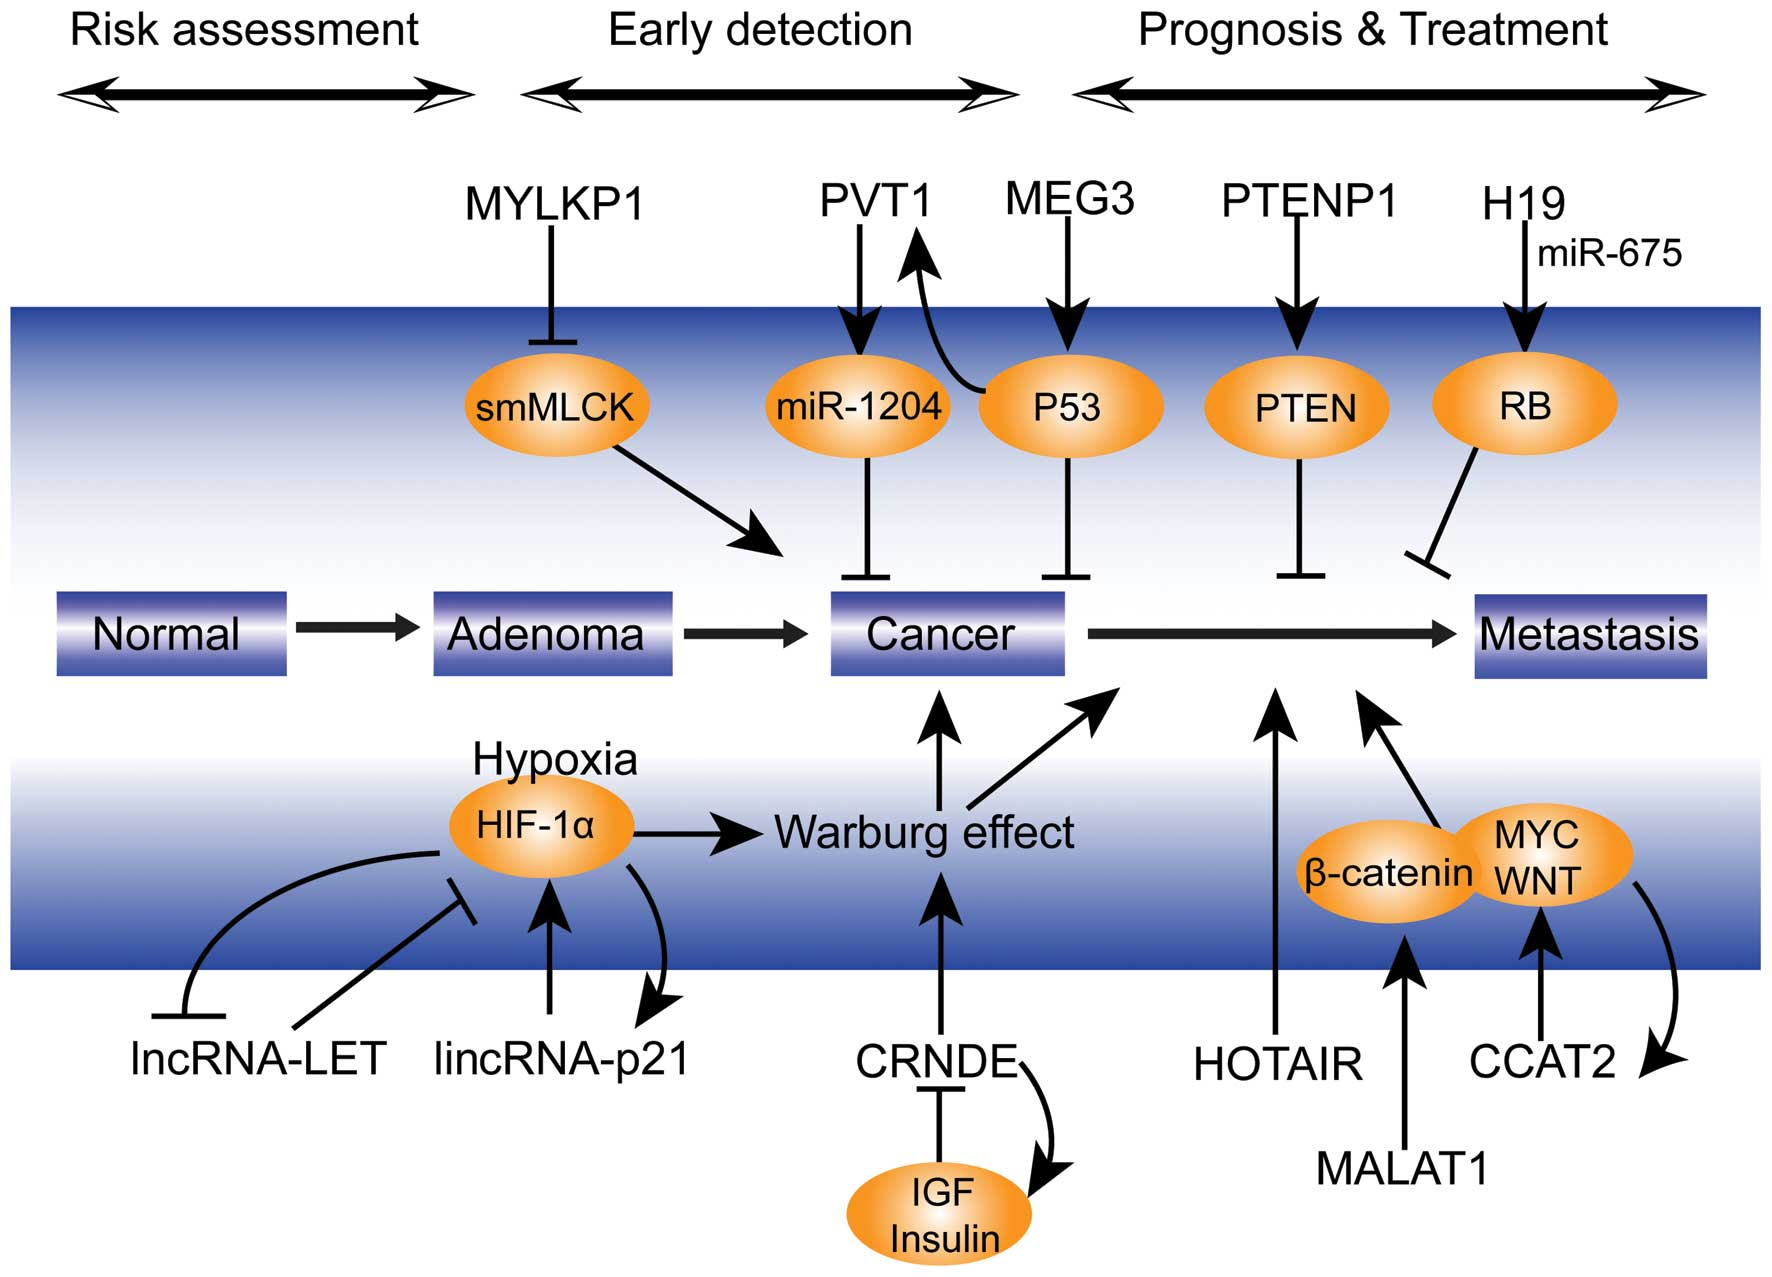 hpv-associated oropharyngeal cancer symptoms enterobiasis adalah